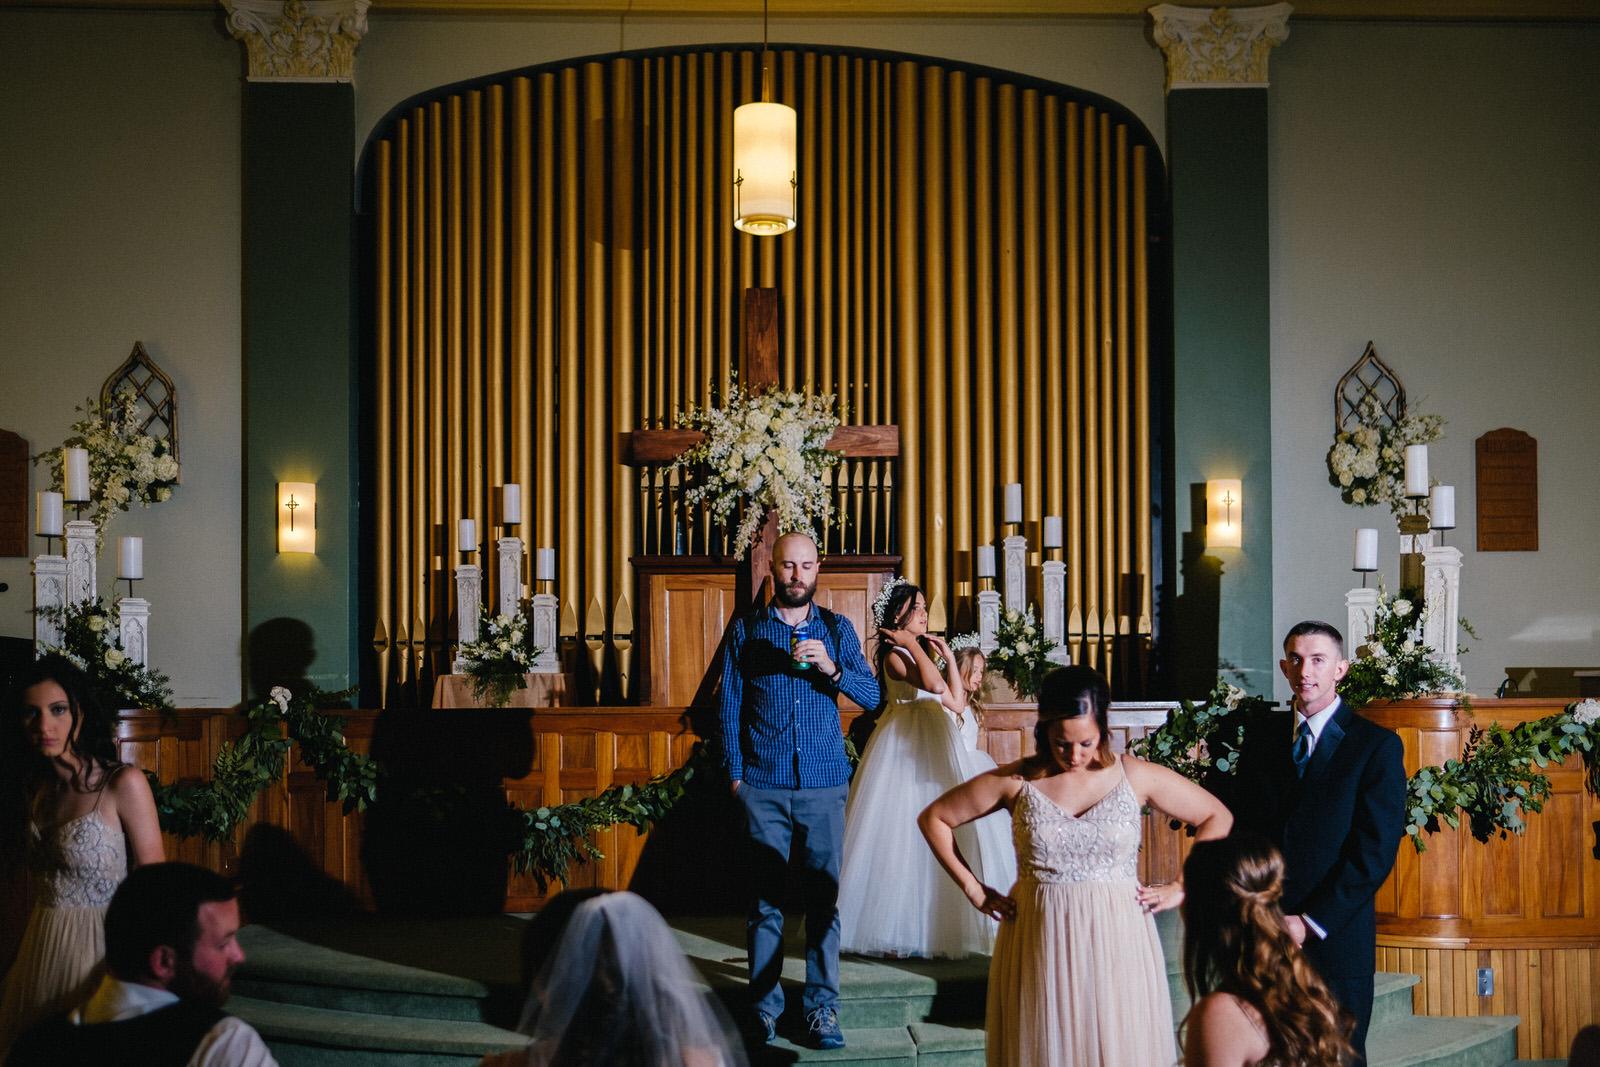 mississippi-wedding-photographer-BTS-006.JPG